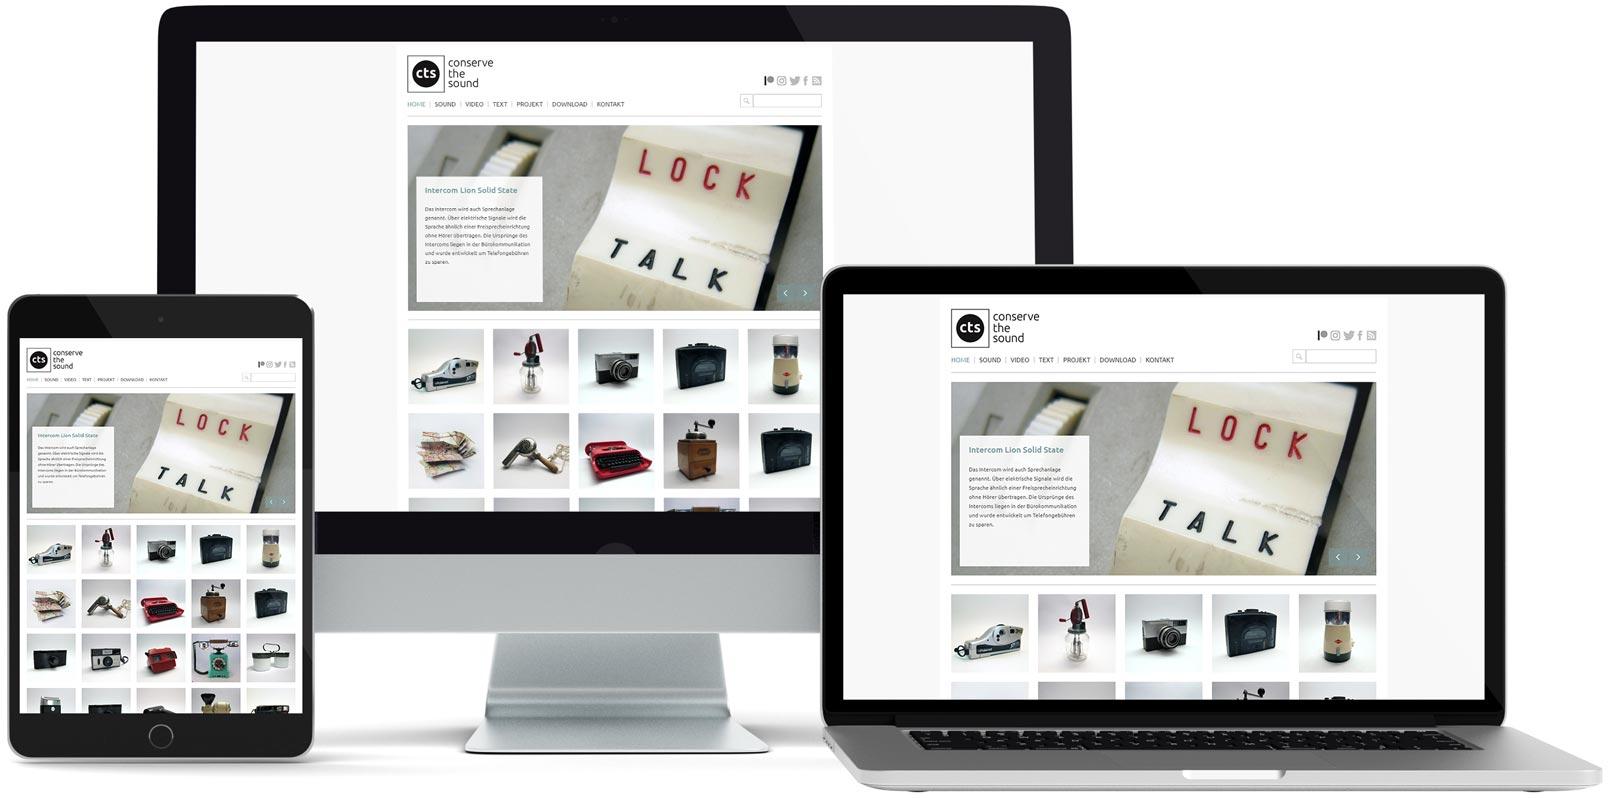 WordPress Webdesign: CTS – conserve the sound